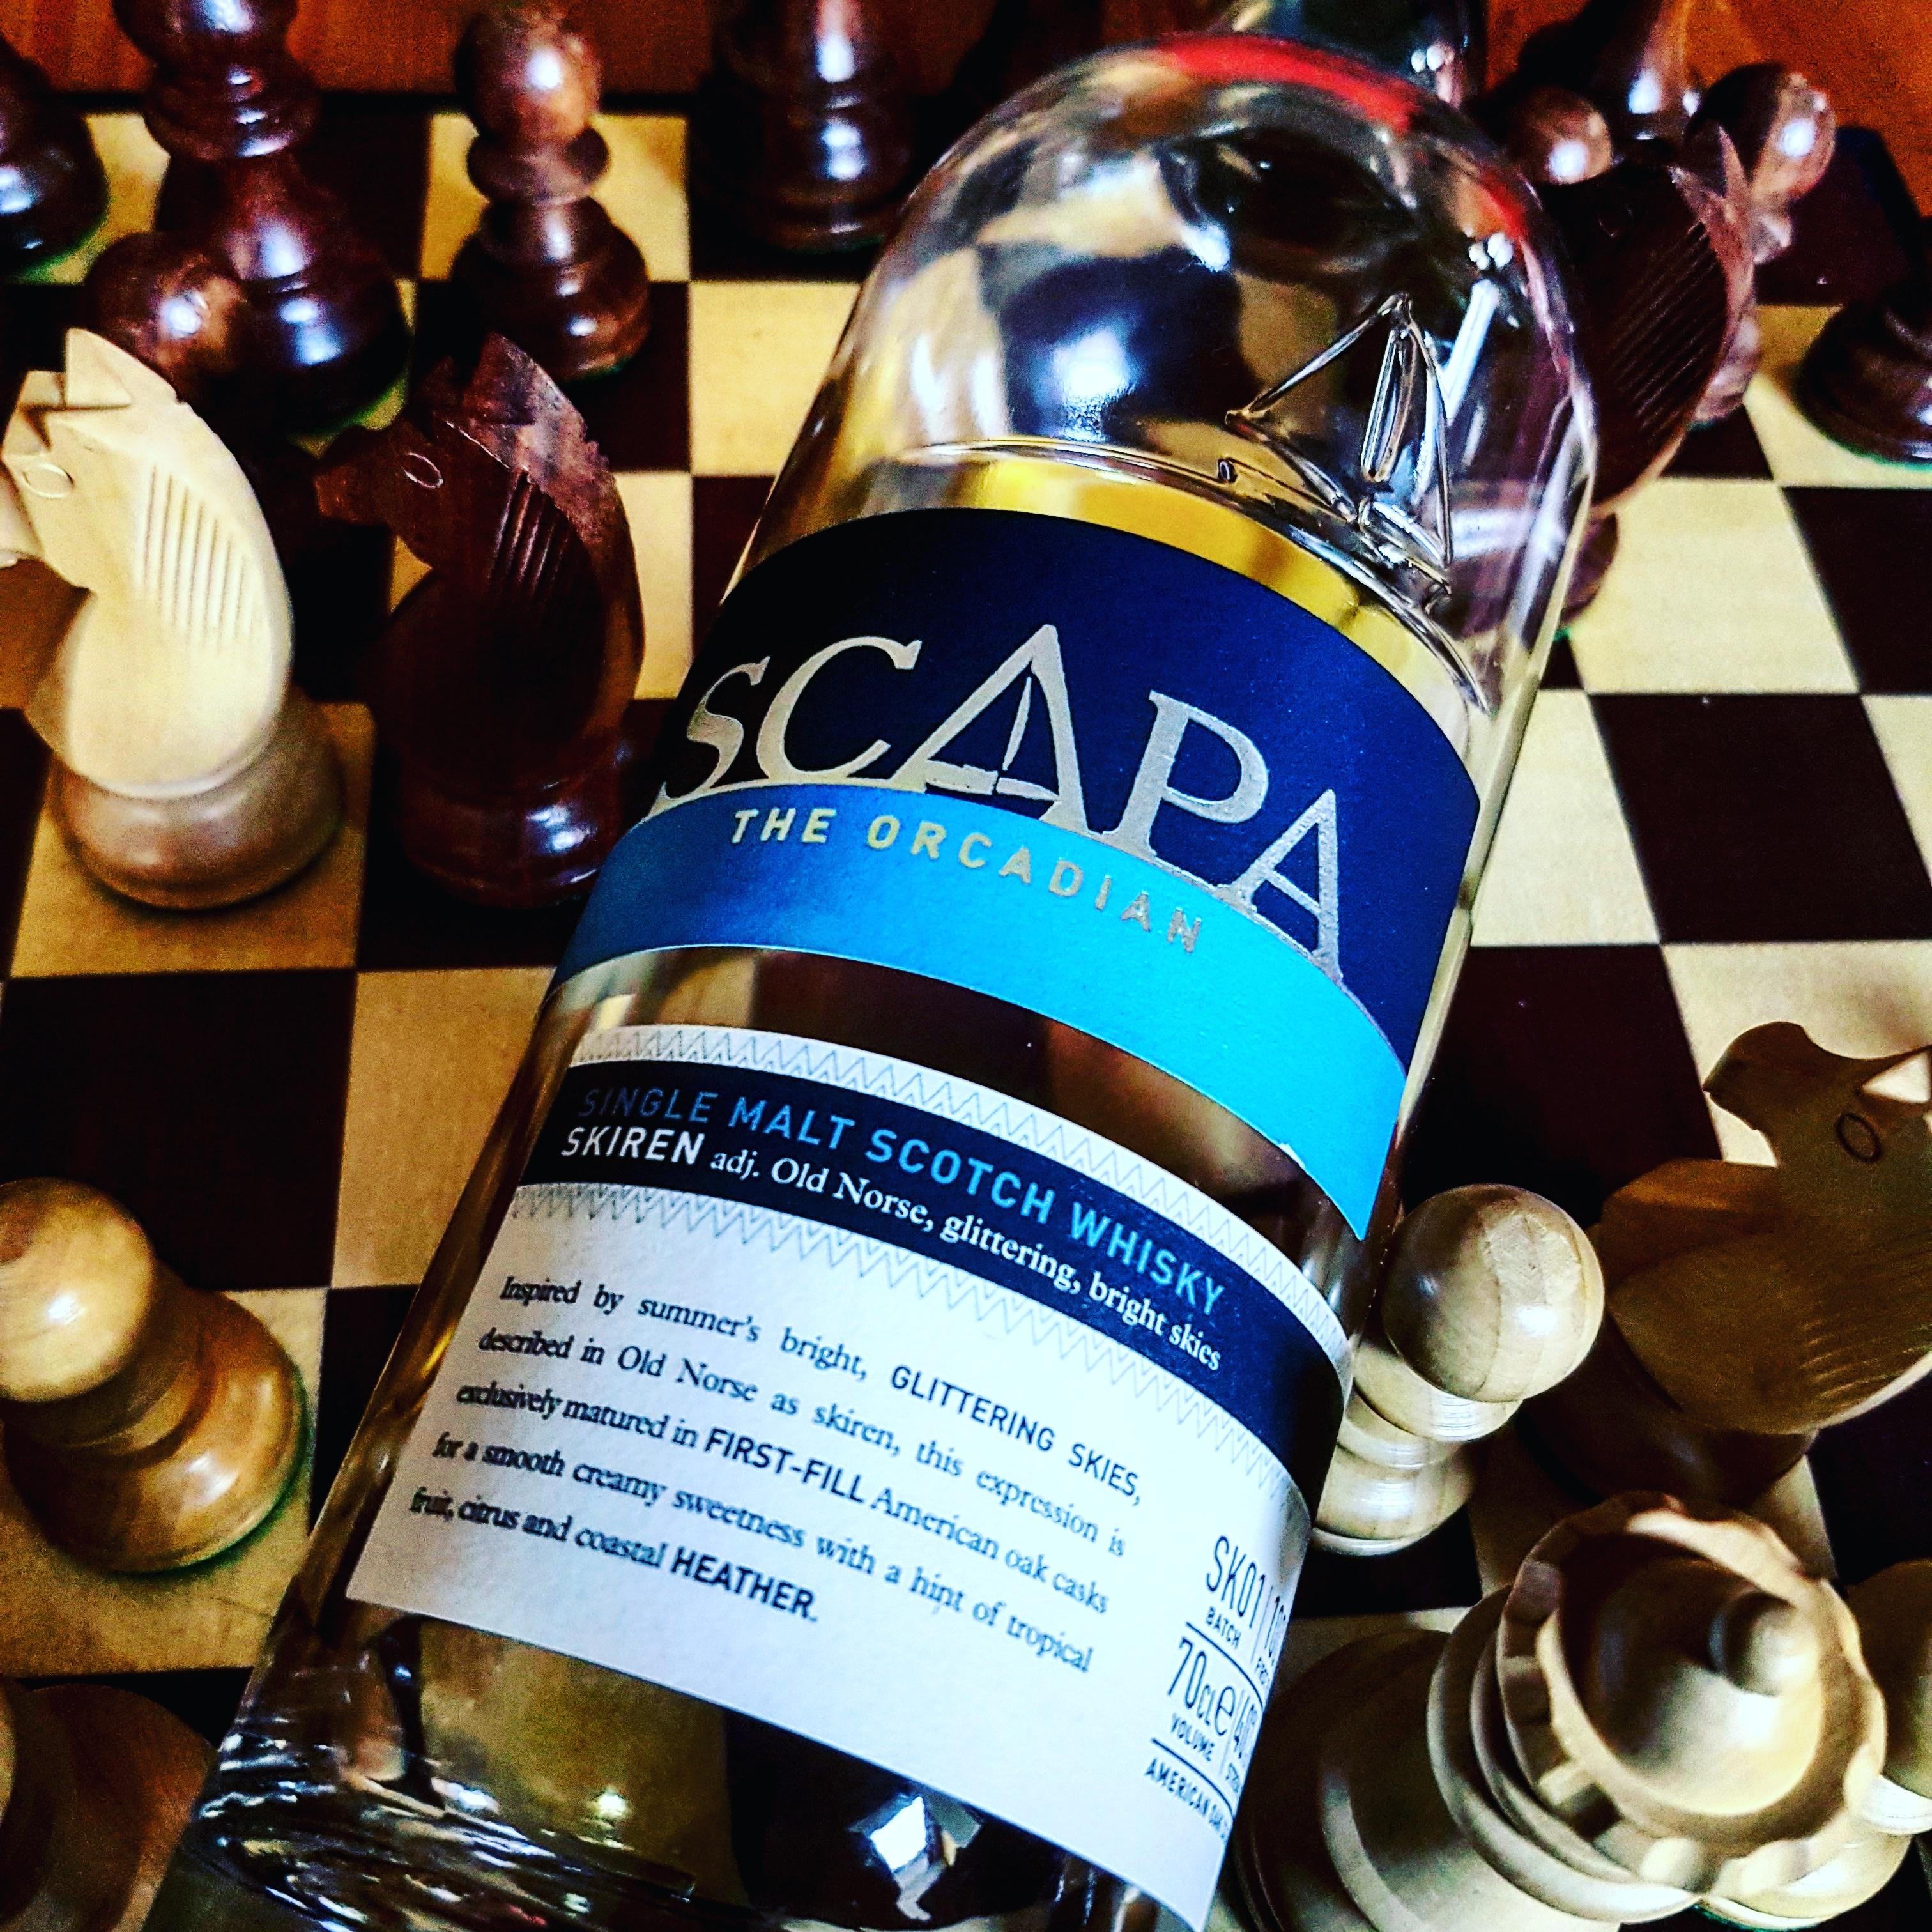 Scapa The Orcadian Skiren Single Malt Scotch Whisky